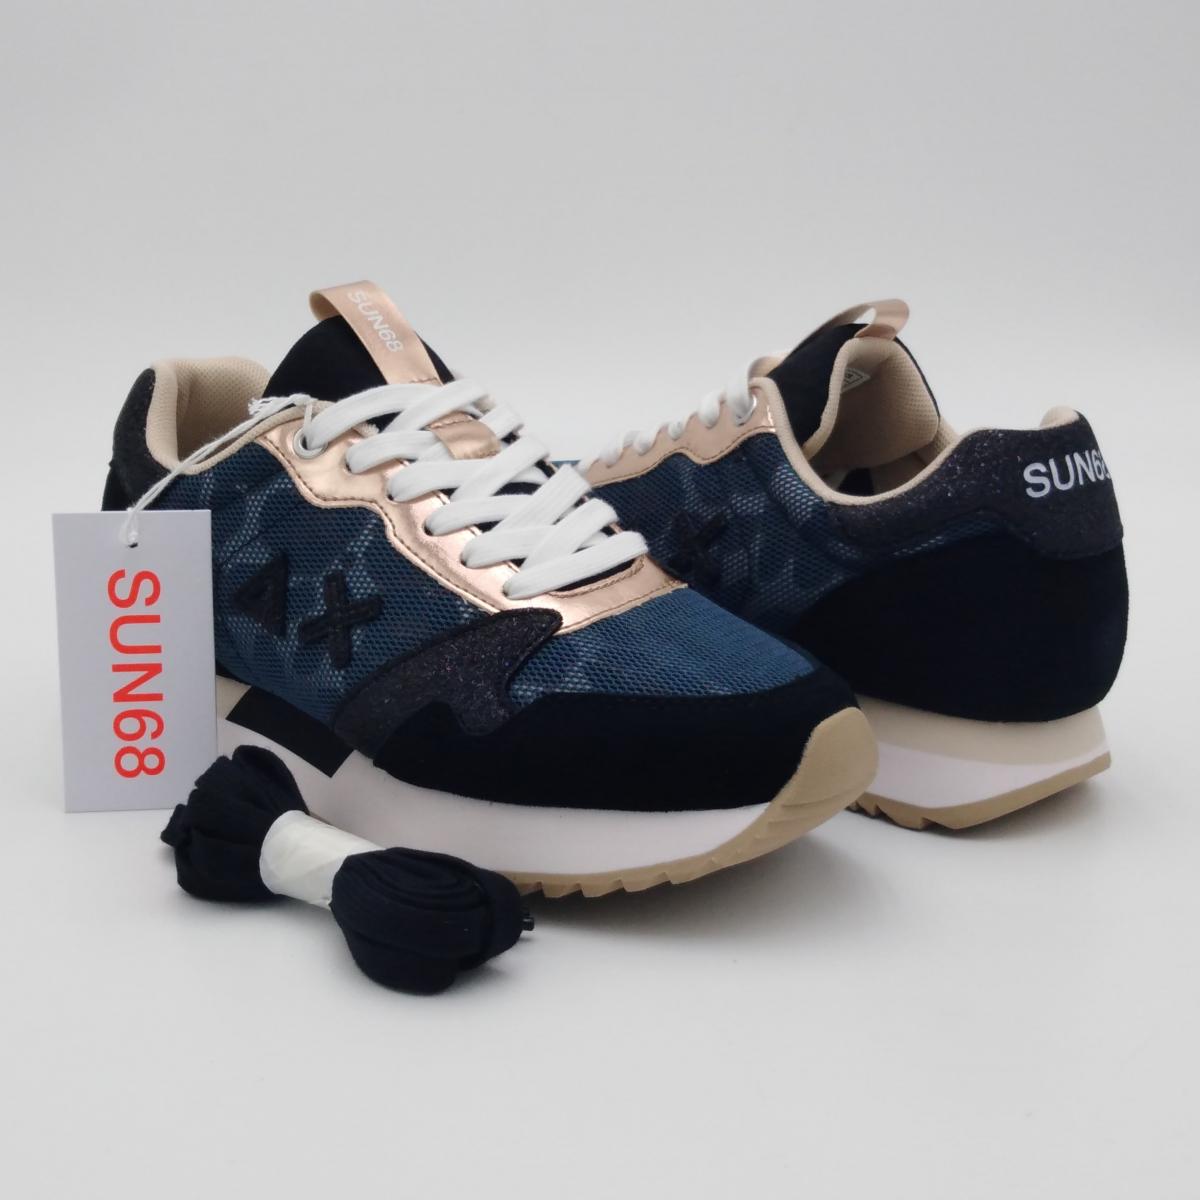 Sun 68 -Sneaker Donna Kelly...